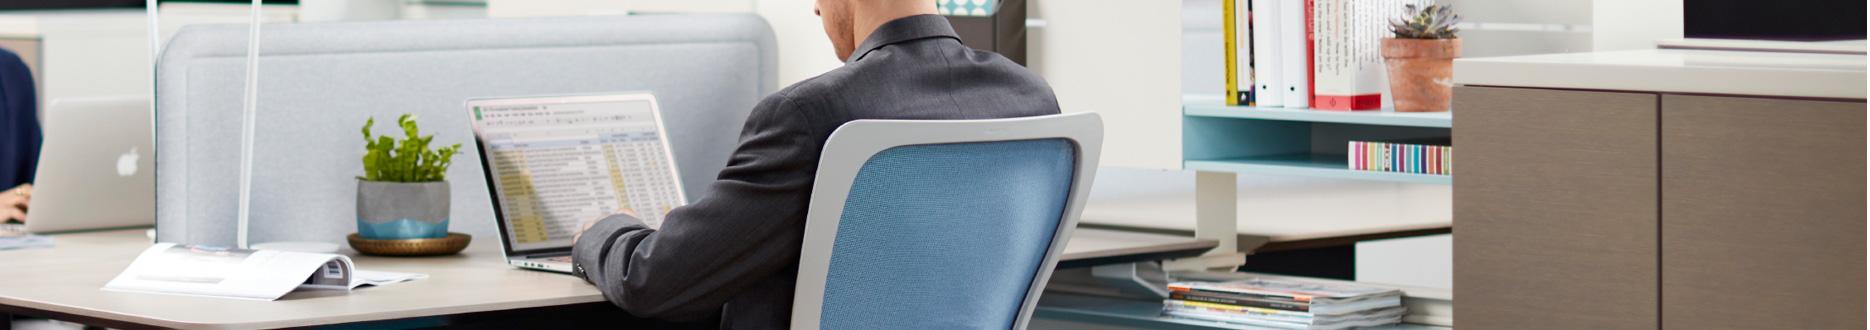 Haworth Systems zody chair